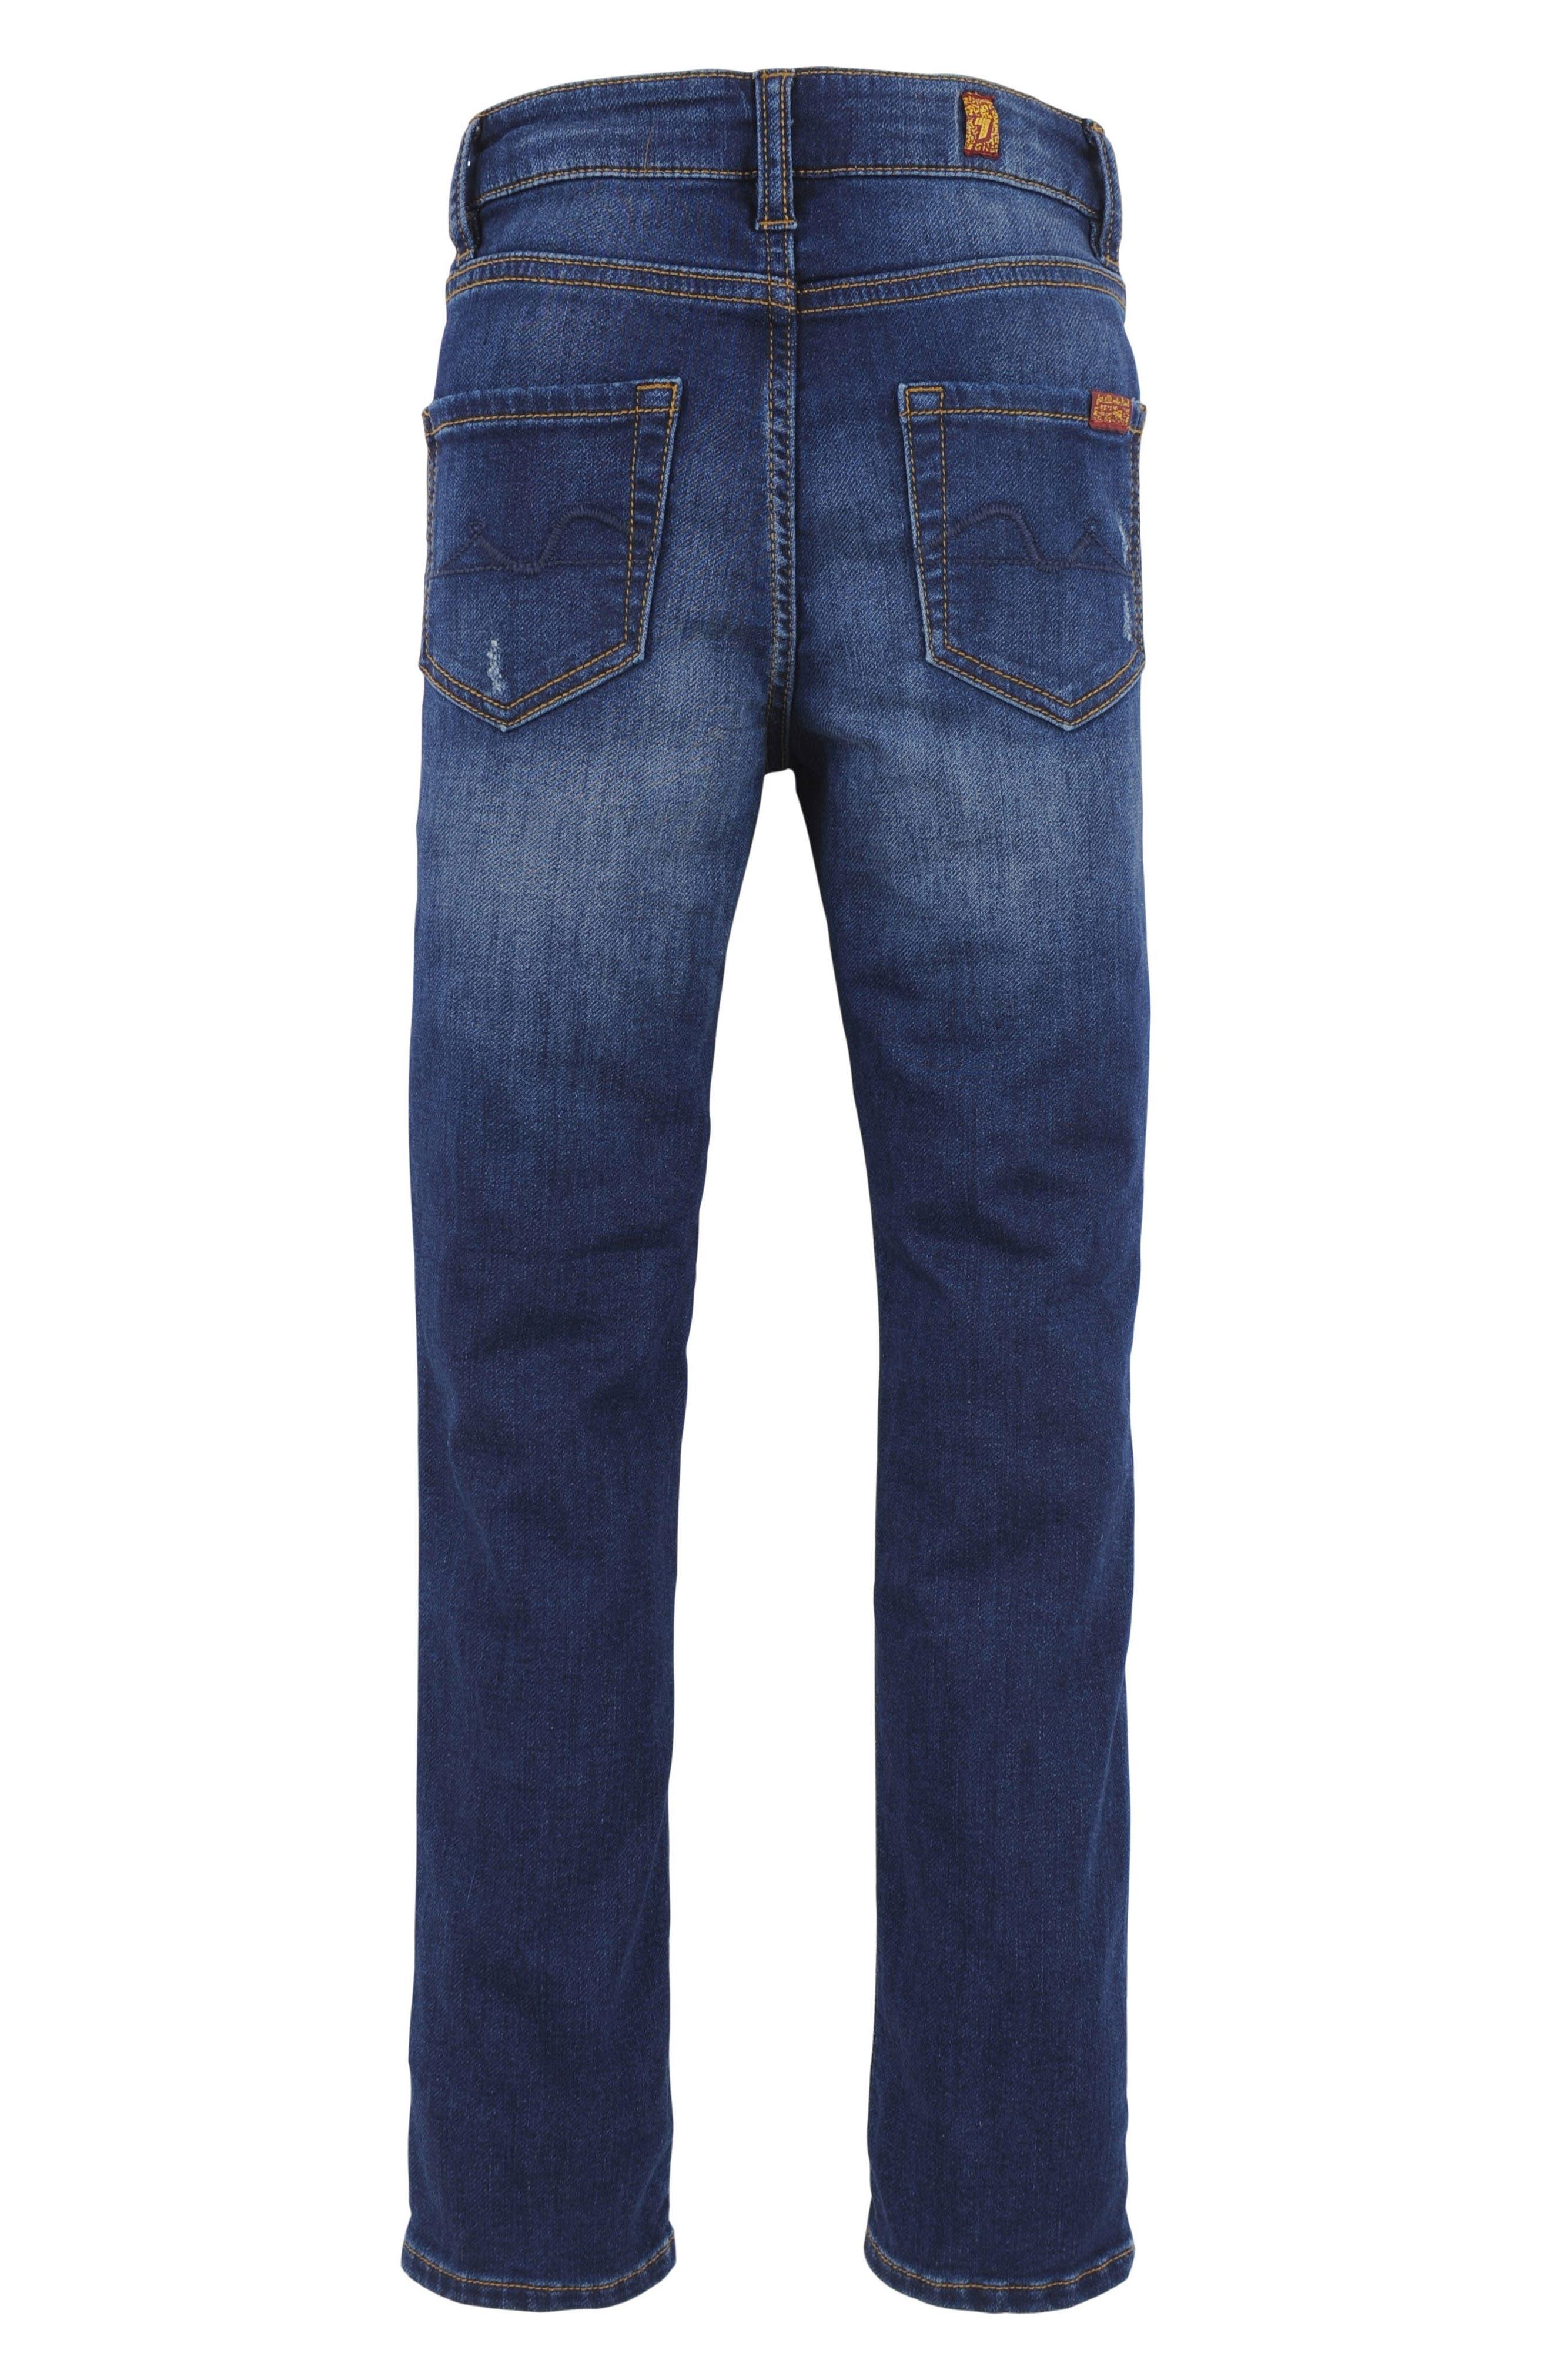 Slimmy Luxe Sport Jeans,                             Alternate thumbnail 2, color,                             453